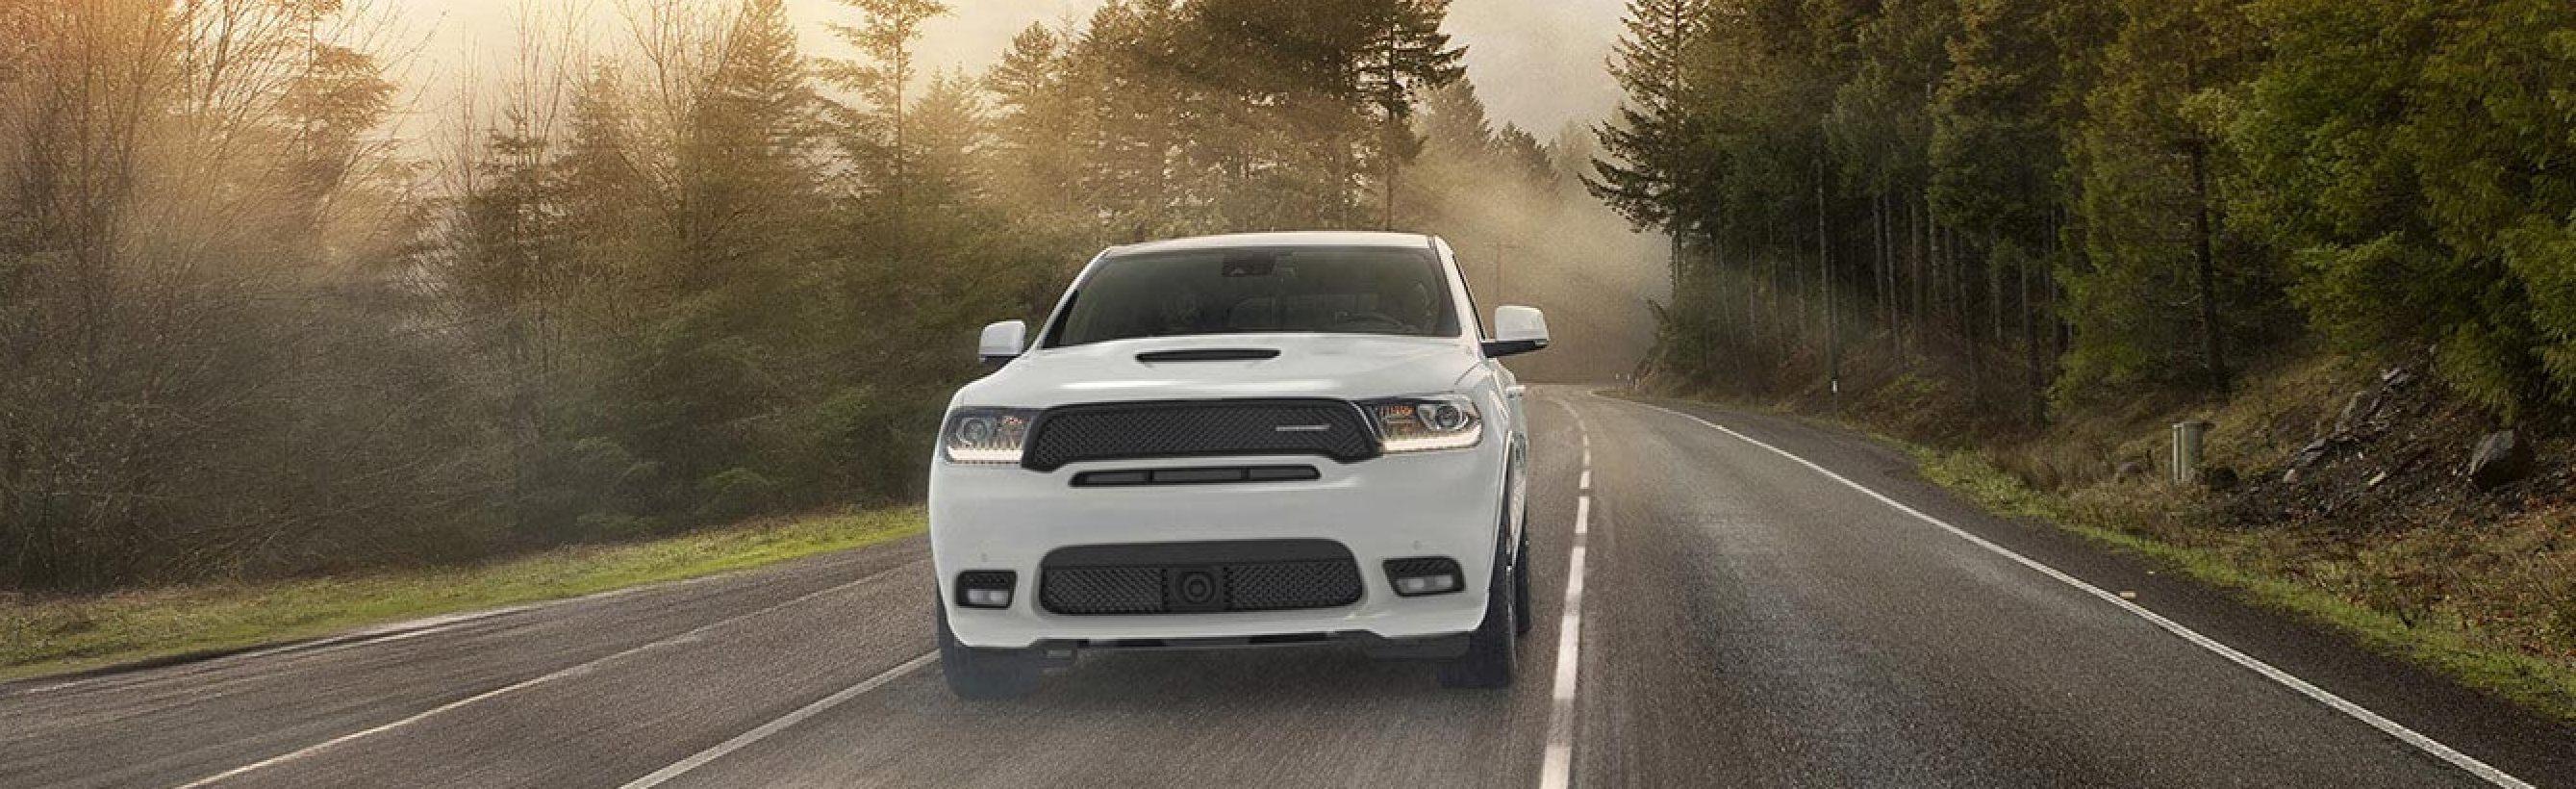 2020 Dodge Durango For Sale Near Tulsa Ok